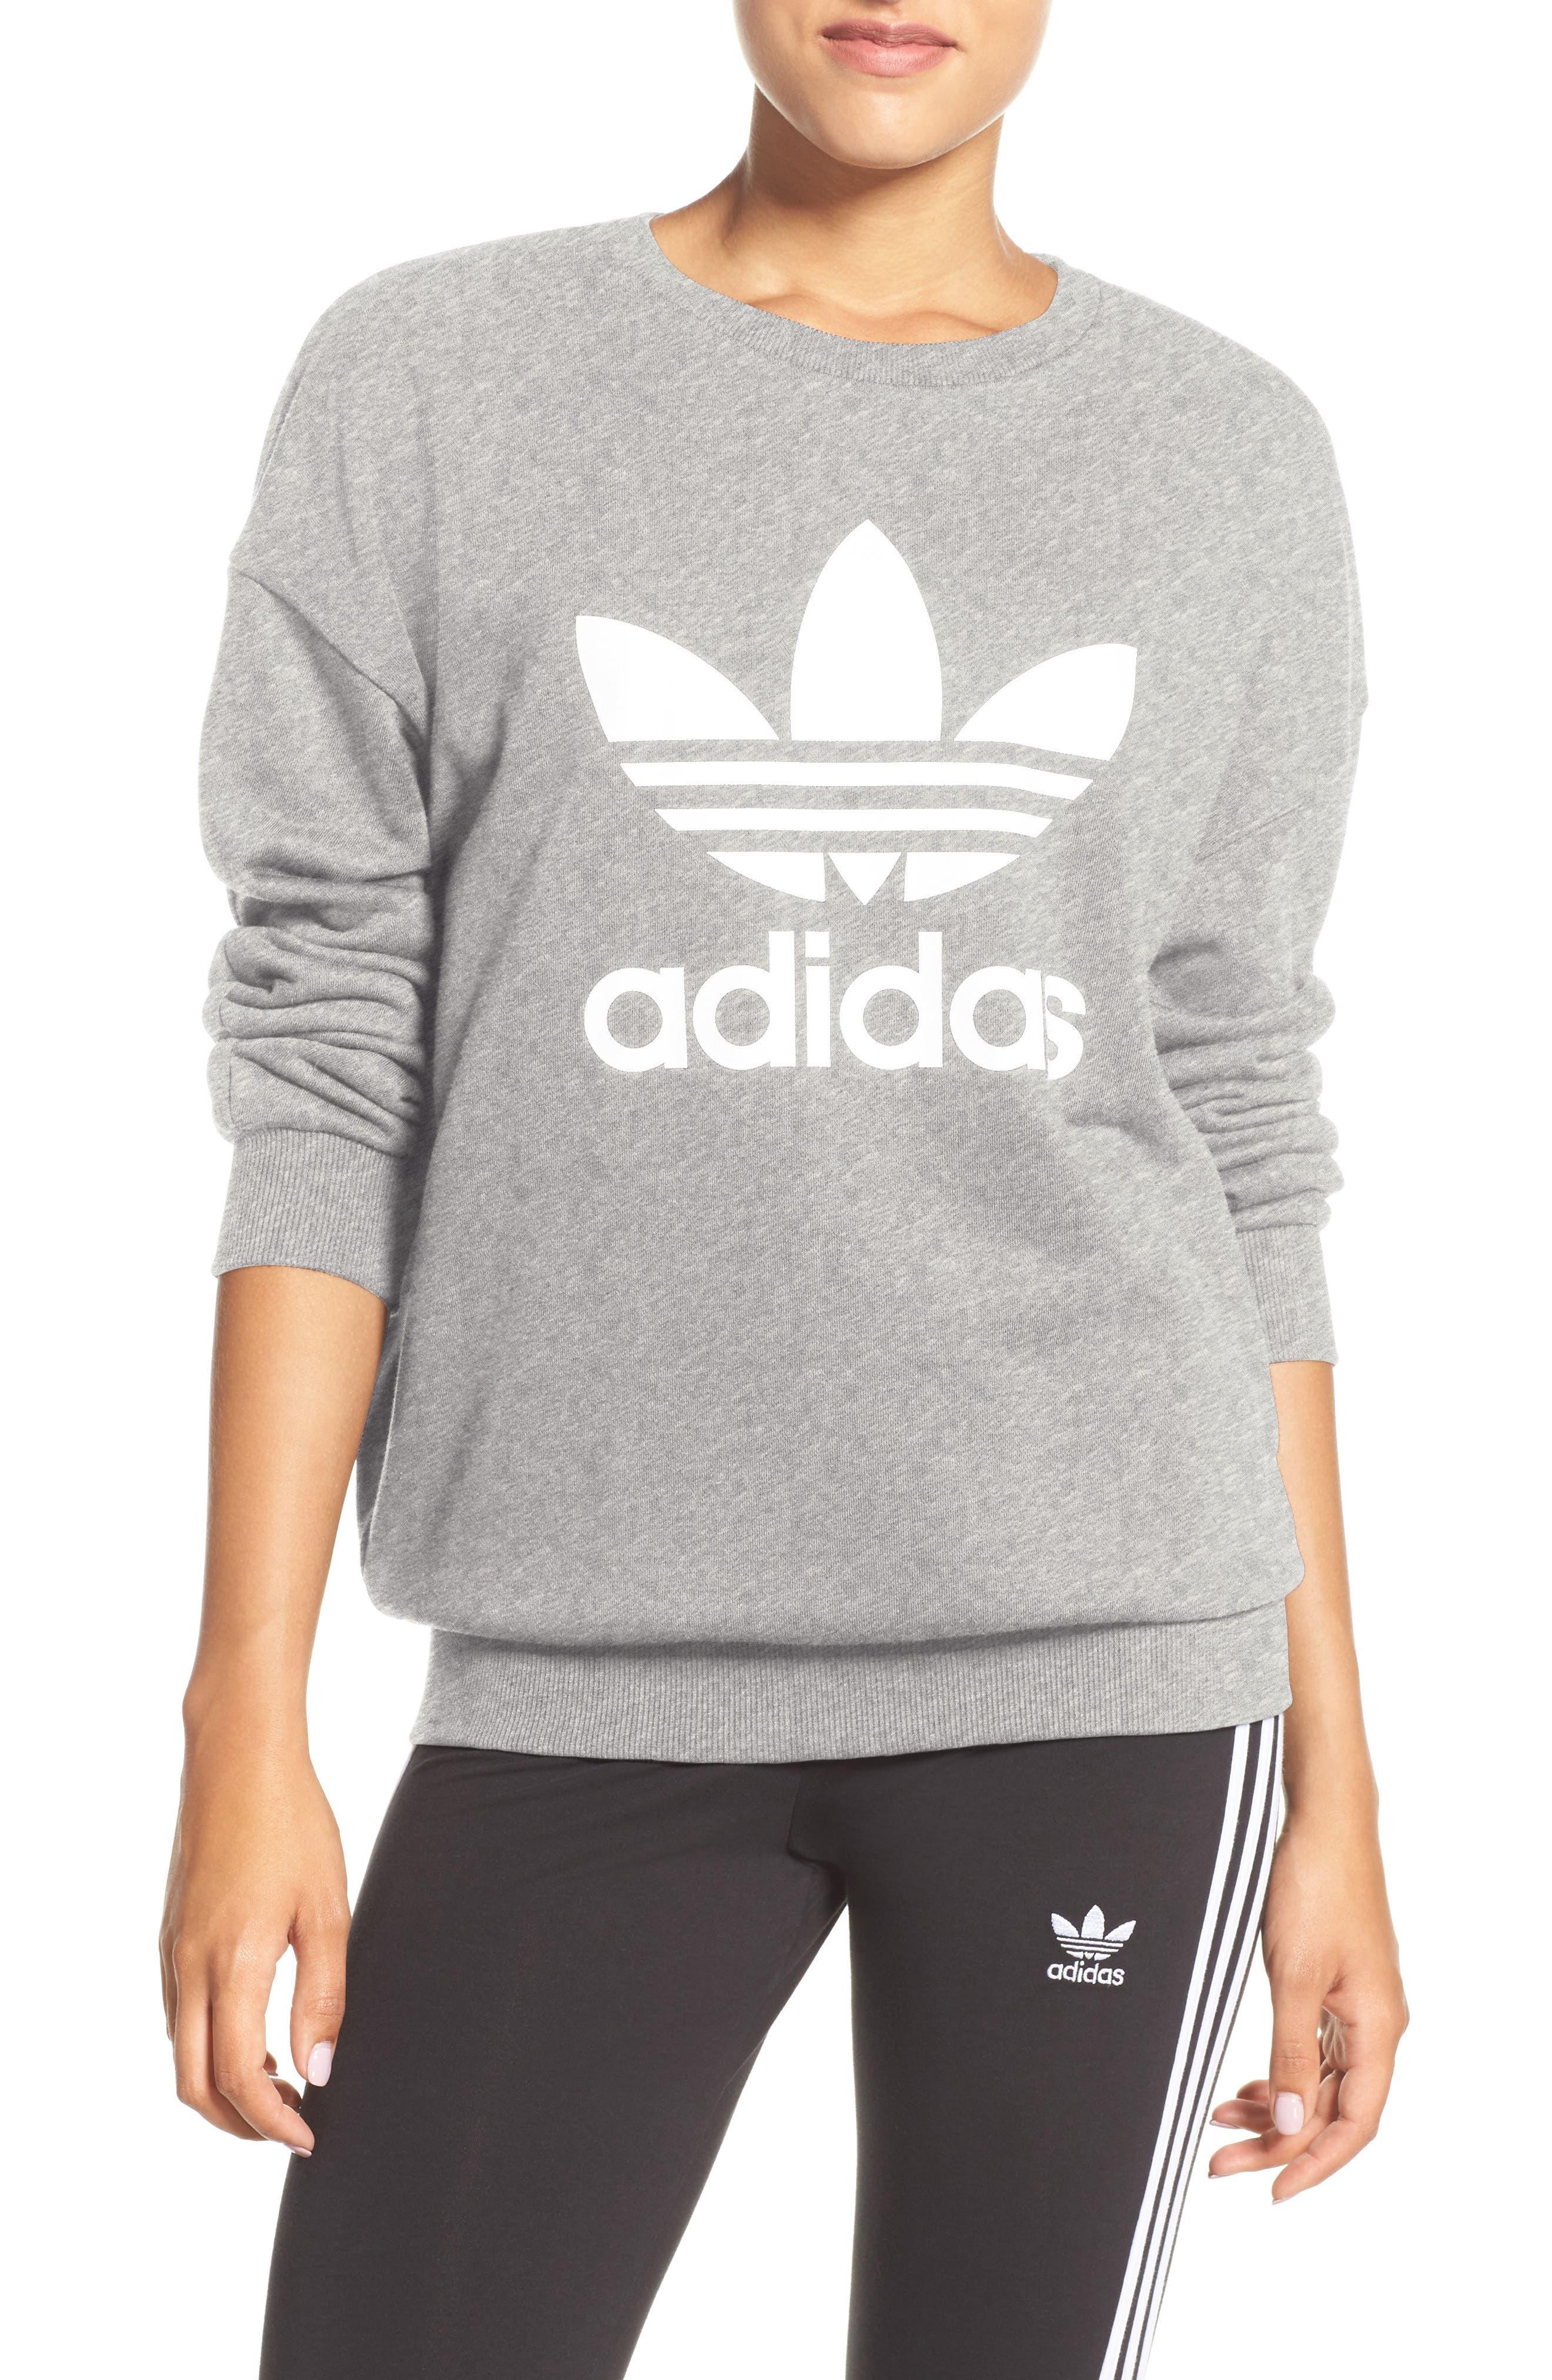 Originals Trefoil Crewneck Sweatshirt,                         Main,                         color, Medium Grey Heather